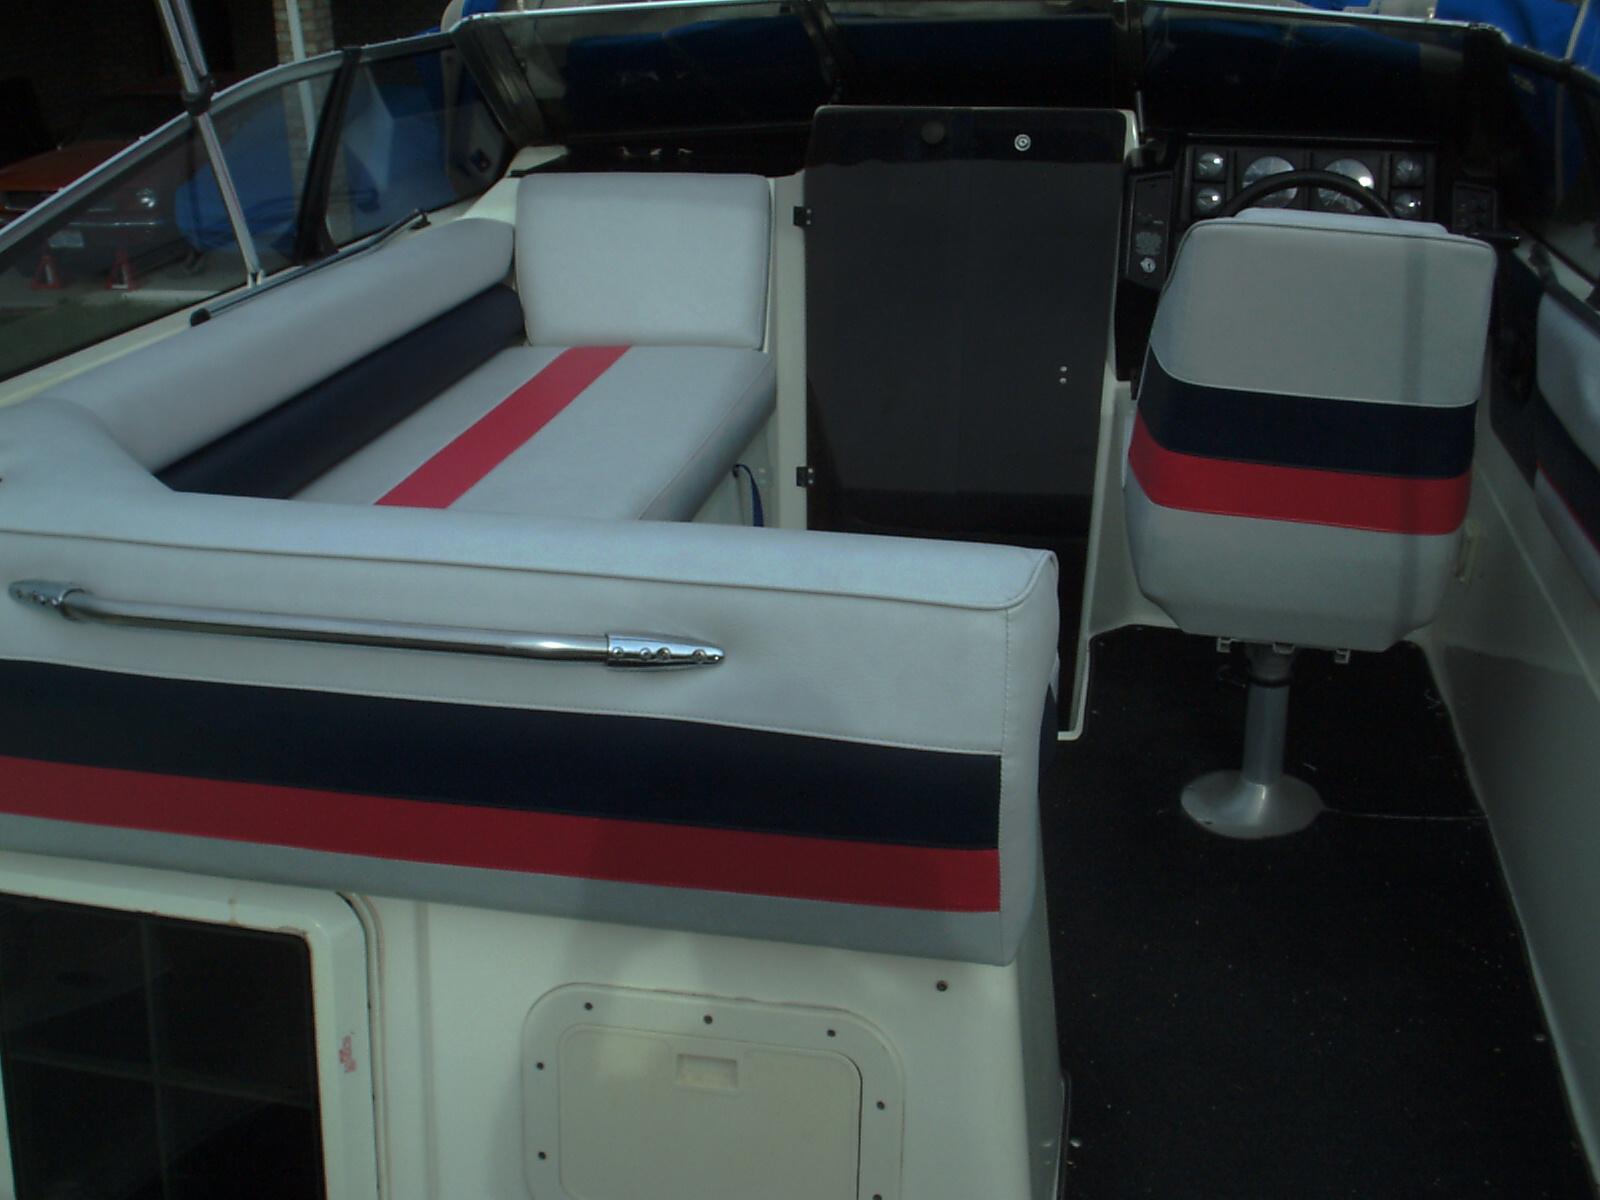 Boat Interiors Sun Decks Boat Seats Covers Canopy